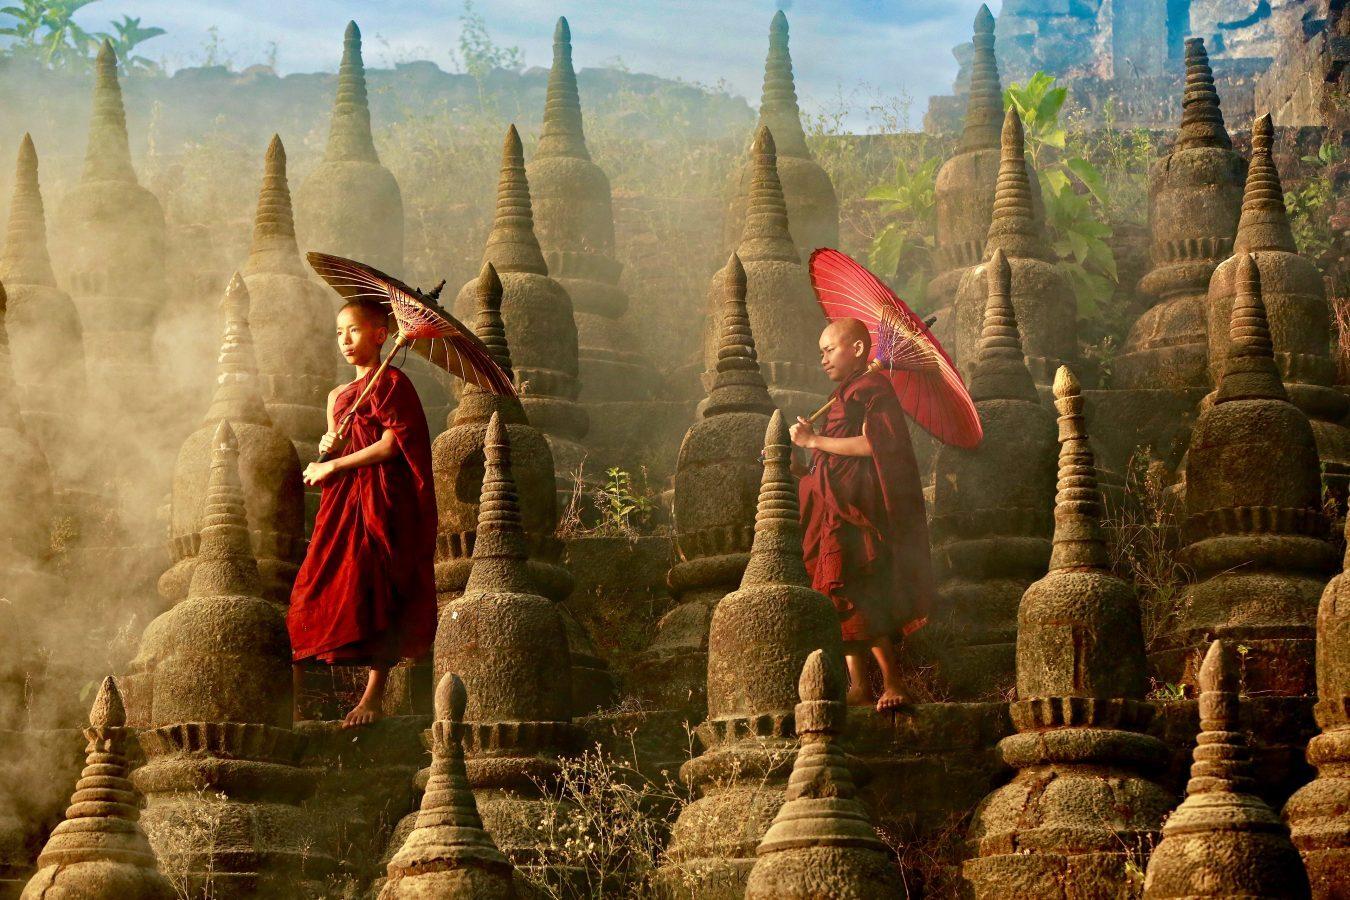 les-birman-groupe-ethnique-de-la-birmanie-2-6109306